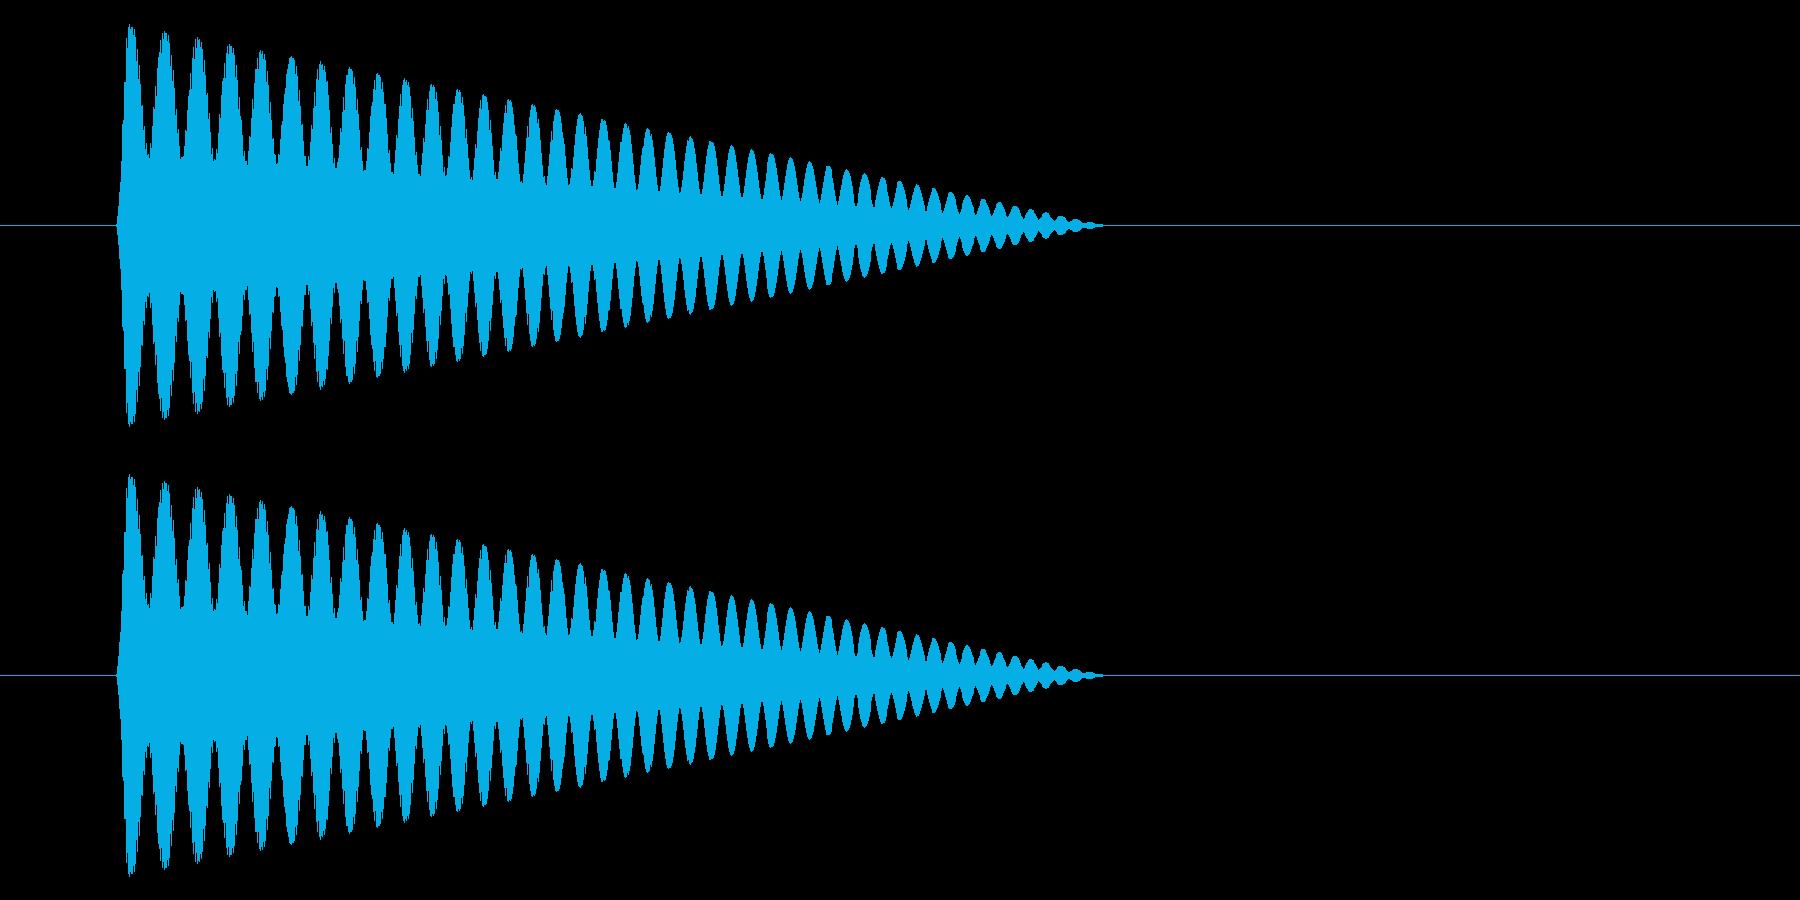 SNES シューティング01-08(アイの再生済みの波形